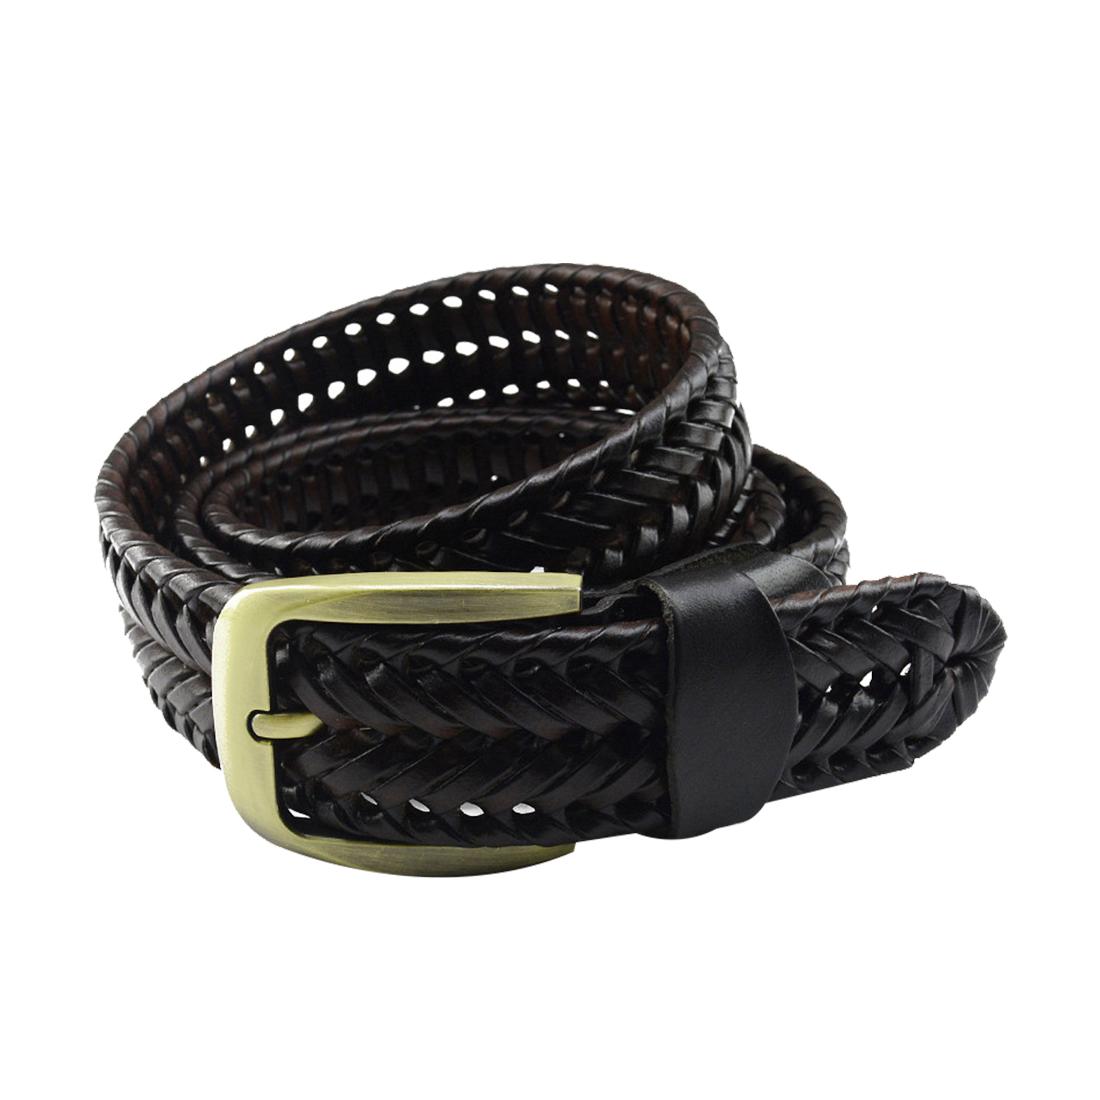 Unisex Hand Made Braided Alloy Pin Buckle Imitation Leather Belt Dark Brown